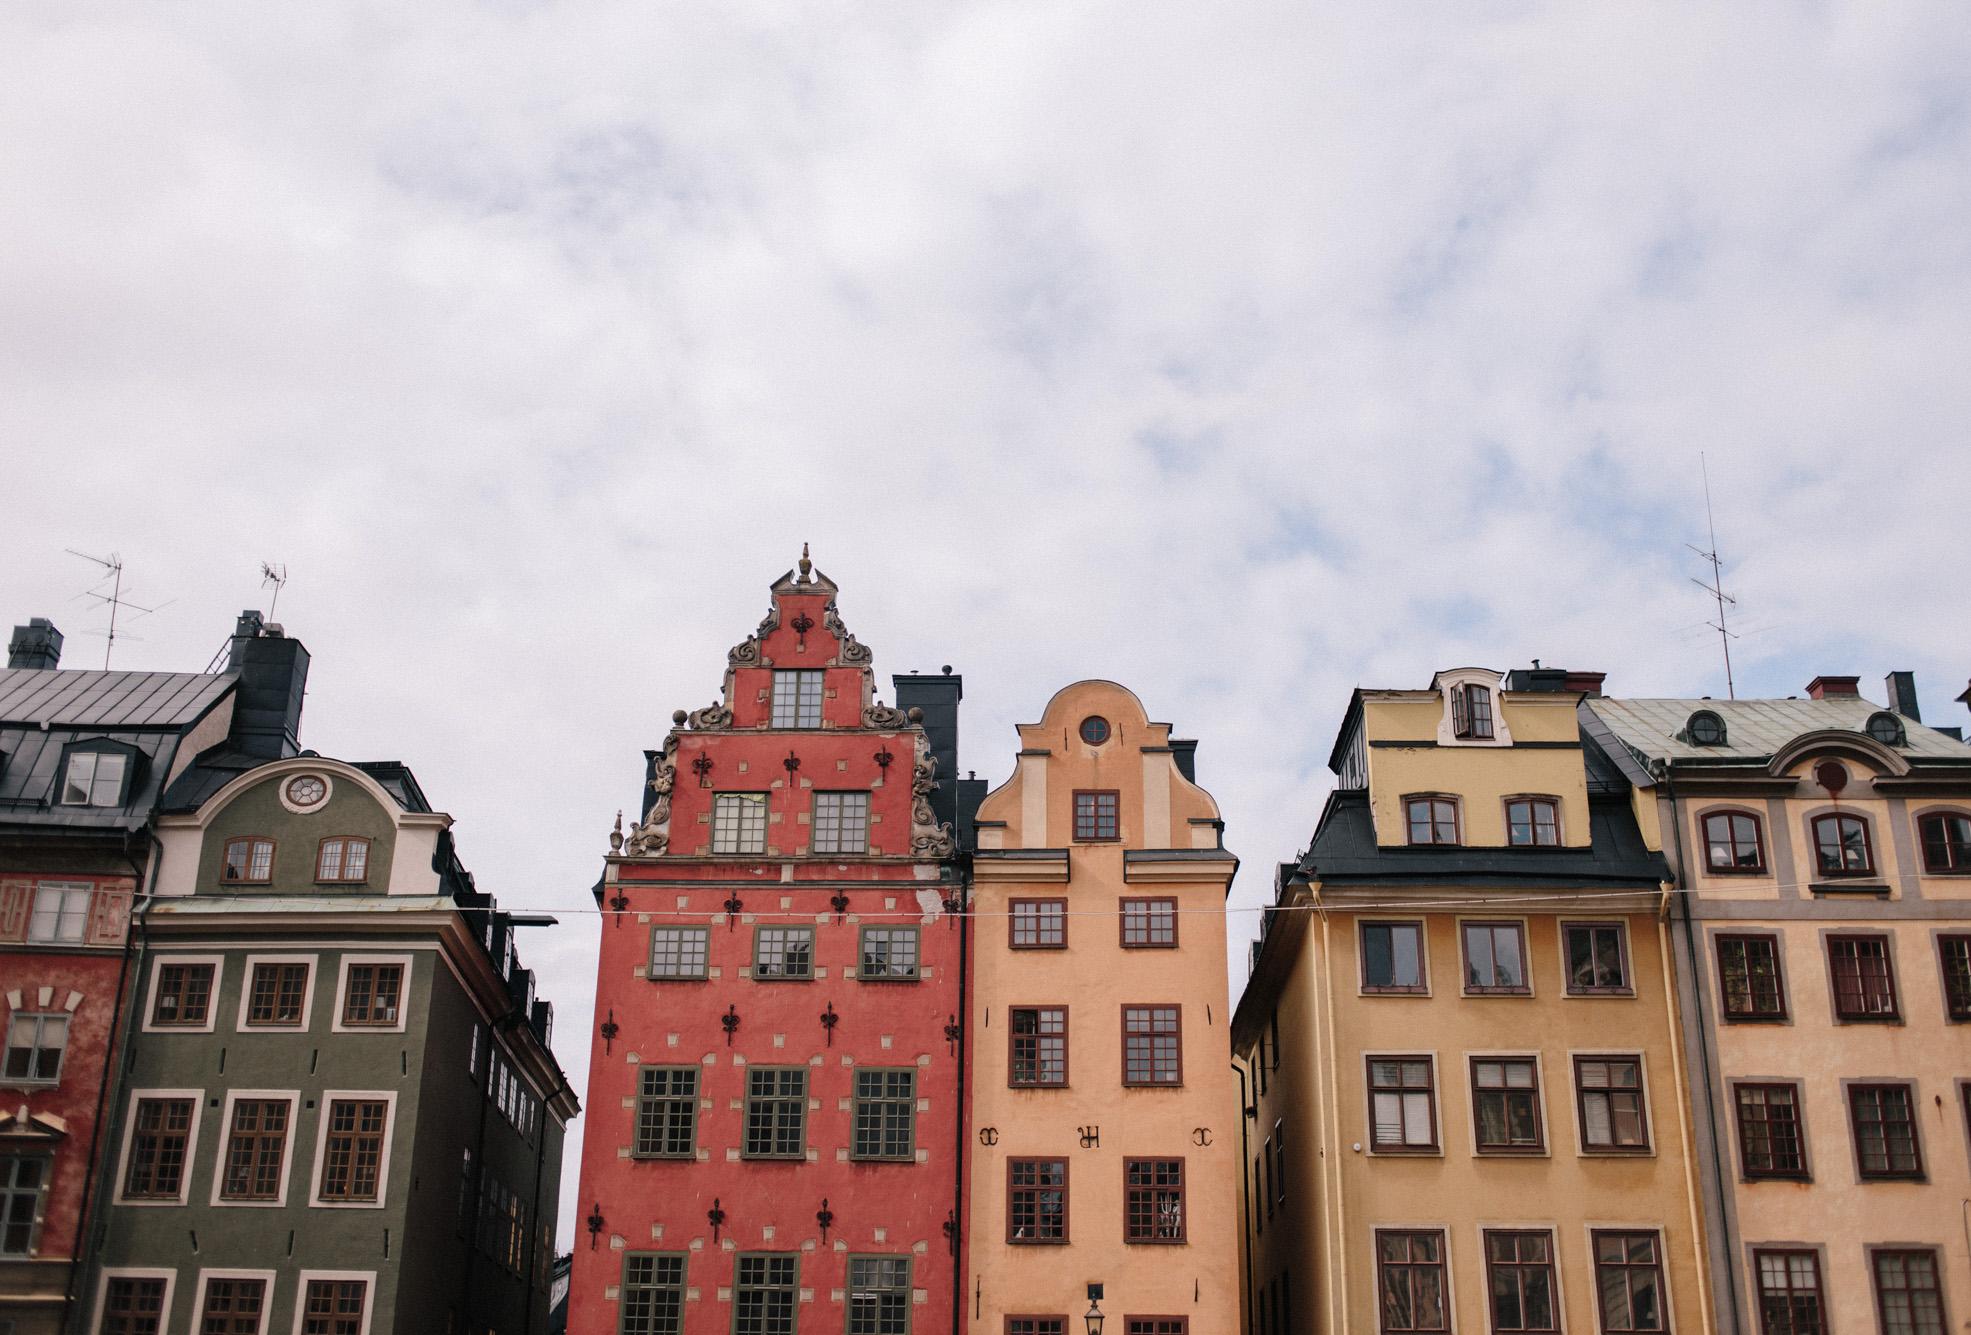 stockholm-kids-cityguide-conbotasdeagua-5.jpg